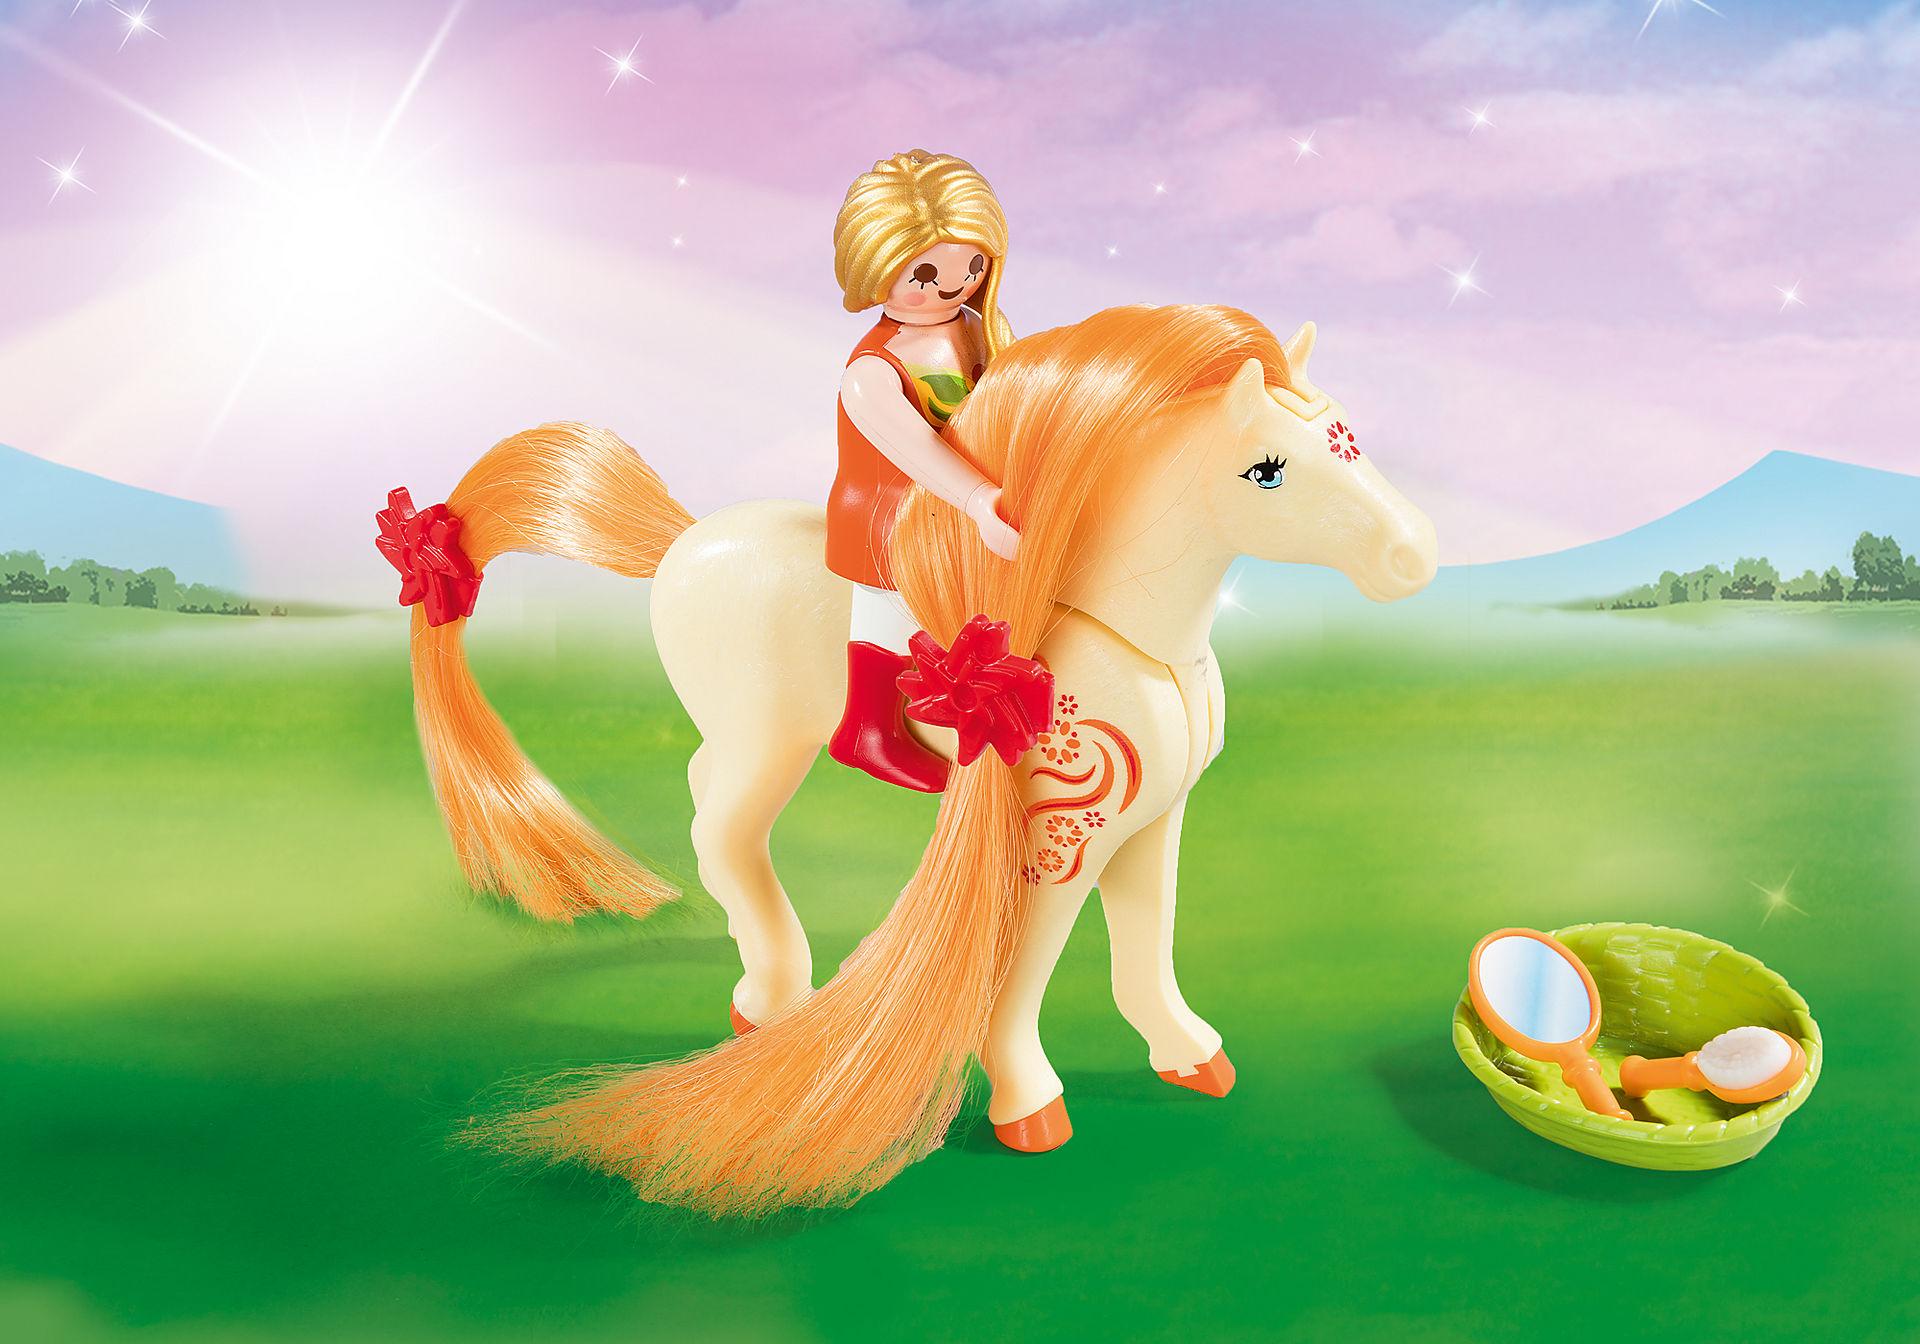 http://media.playmobil.com/i/playmobil/5656_product_extra2/Maxi Βαλιτσάκι Πριγκίπισσα με άλογο